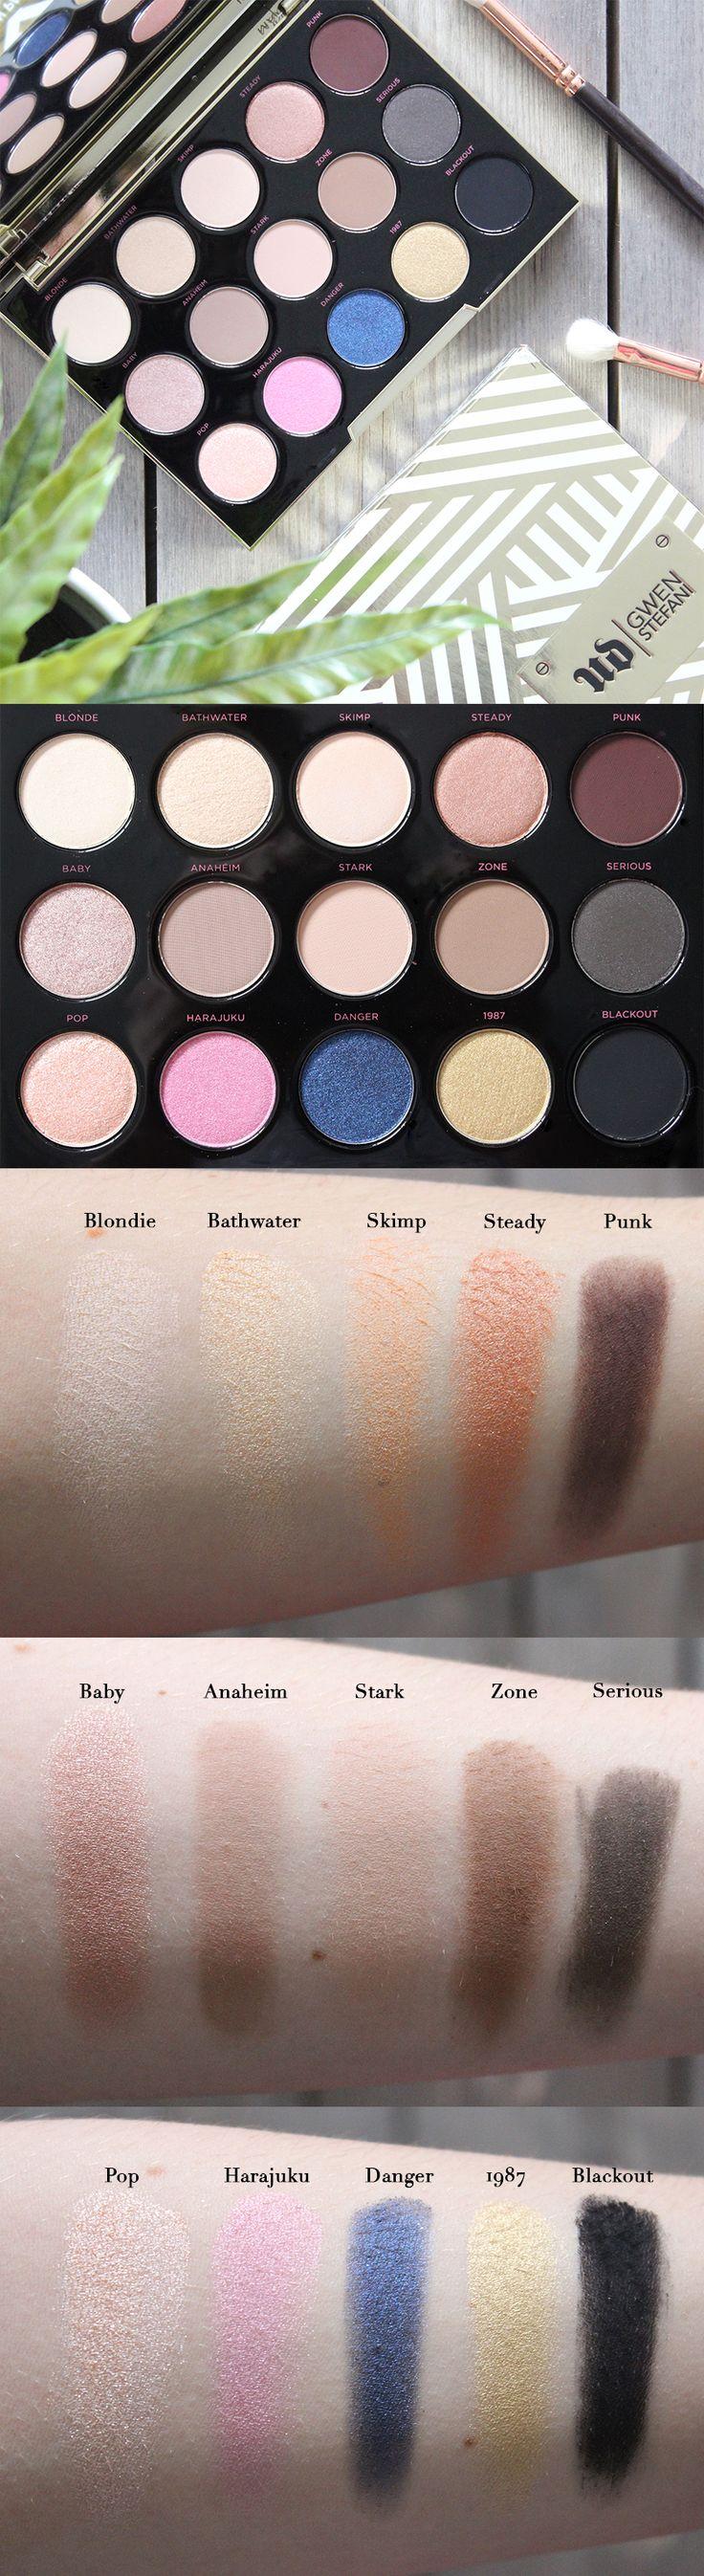 Urban Decay Gwen Stefani Eyeshadow Palette | Review & Swatches.